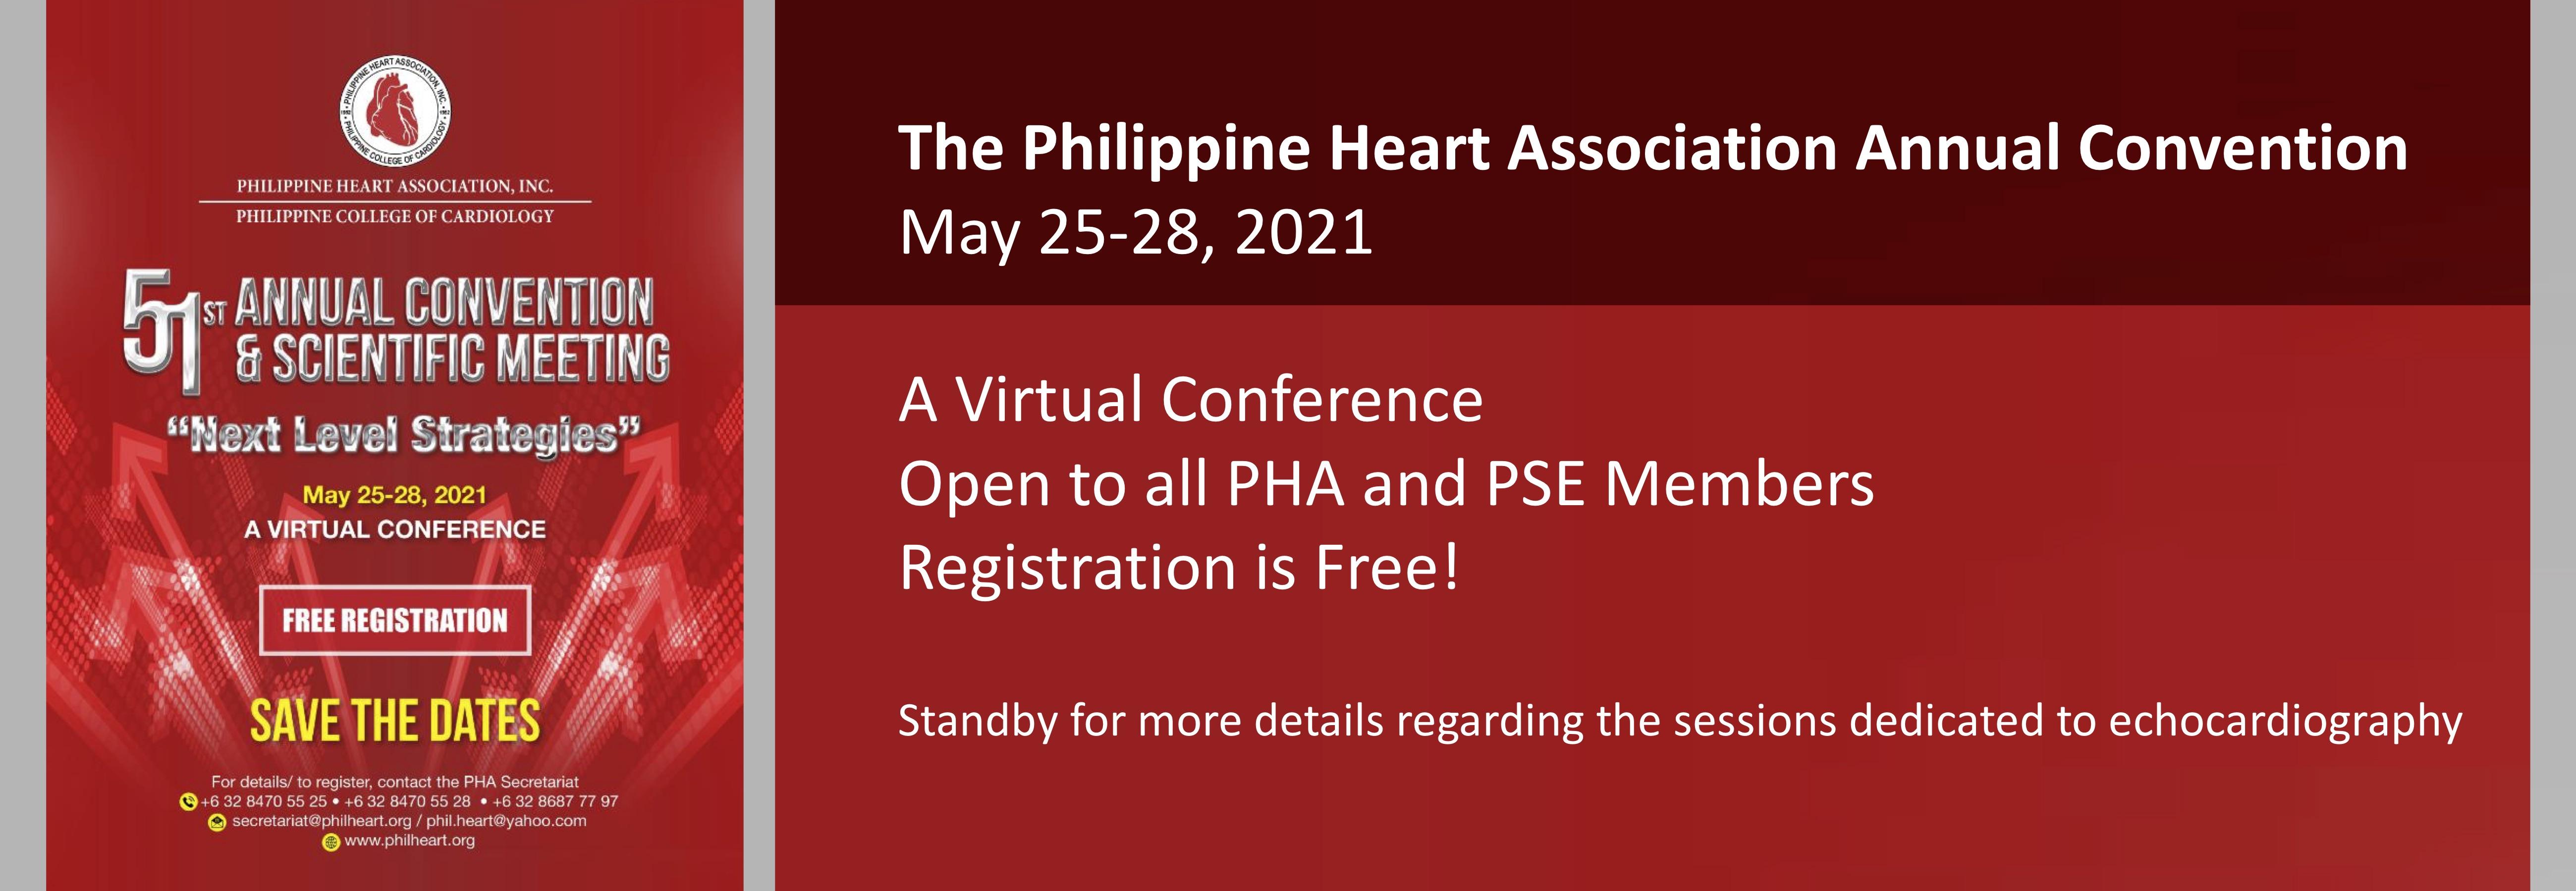 PHA_Convention_2021